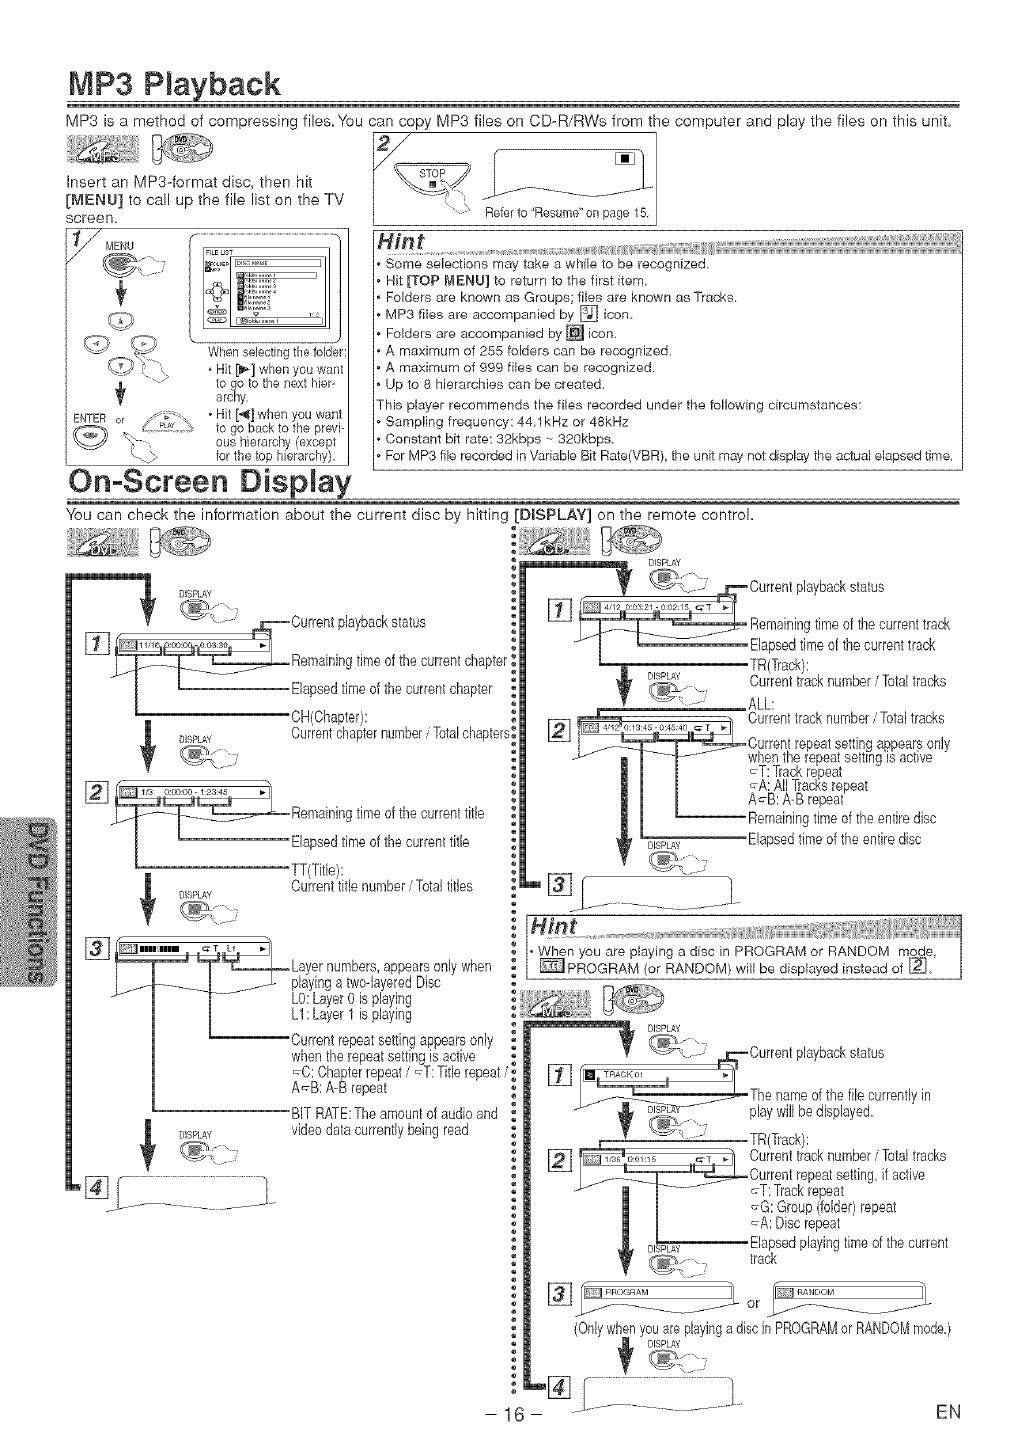 Sylvania DVC840F User Manual DVD/VCR Manuals And Guides